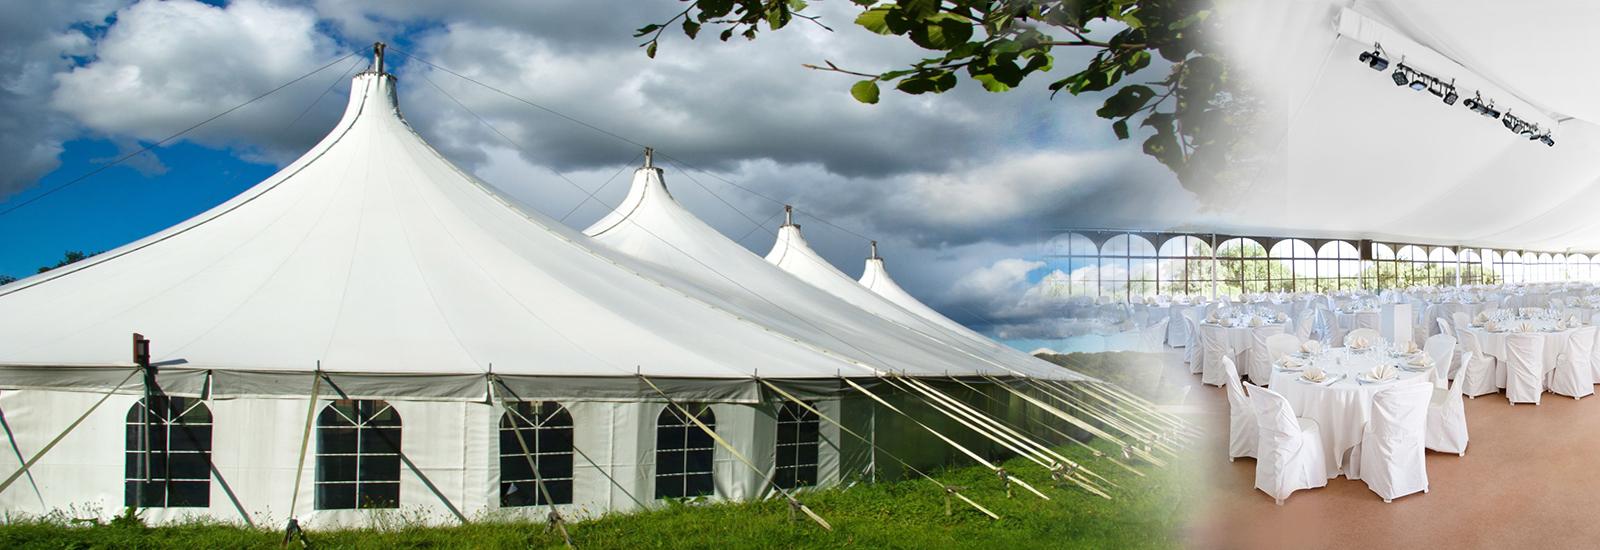 Joliet Tent Company